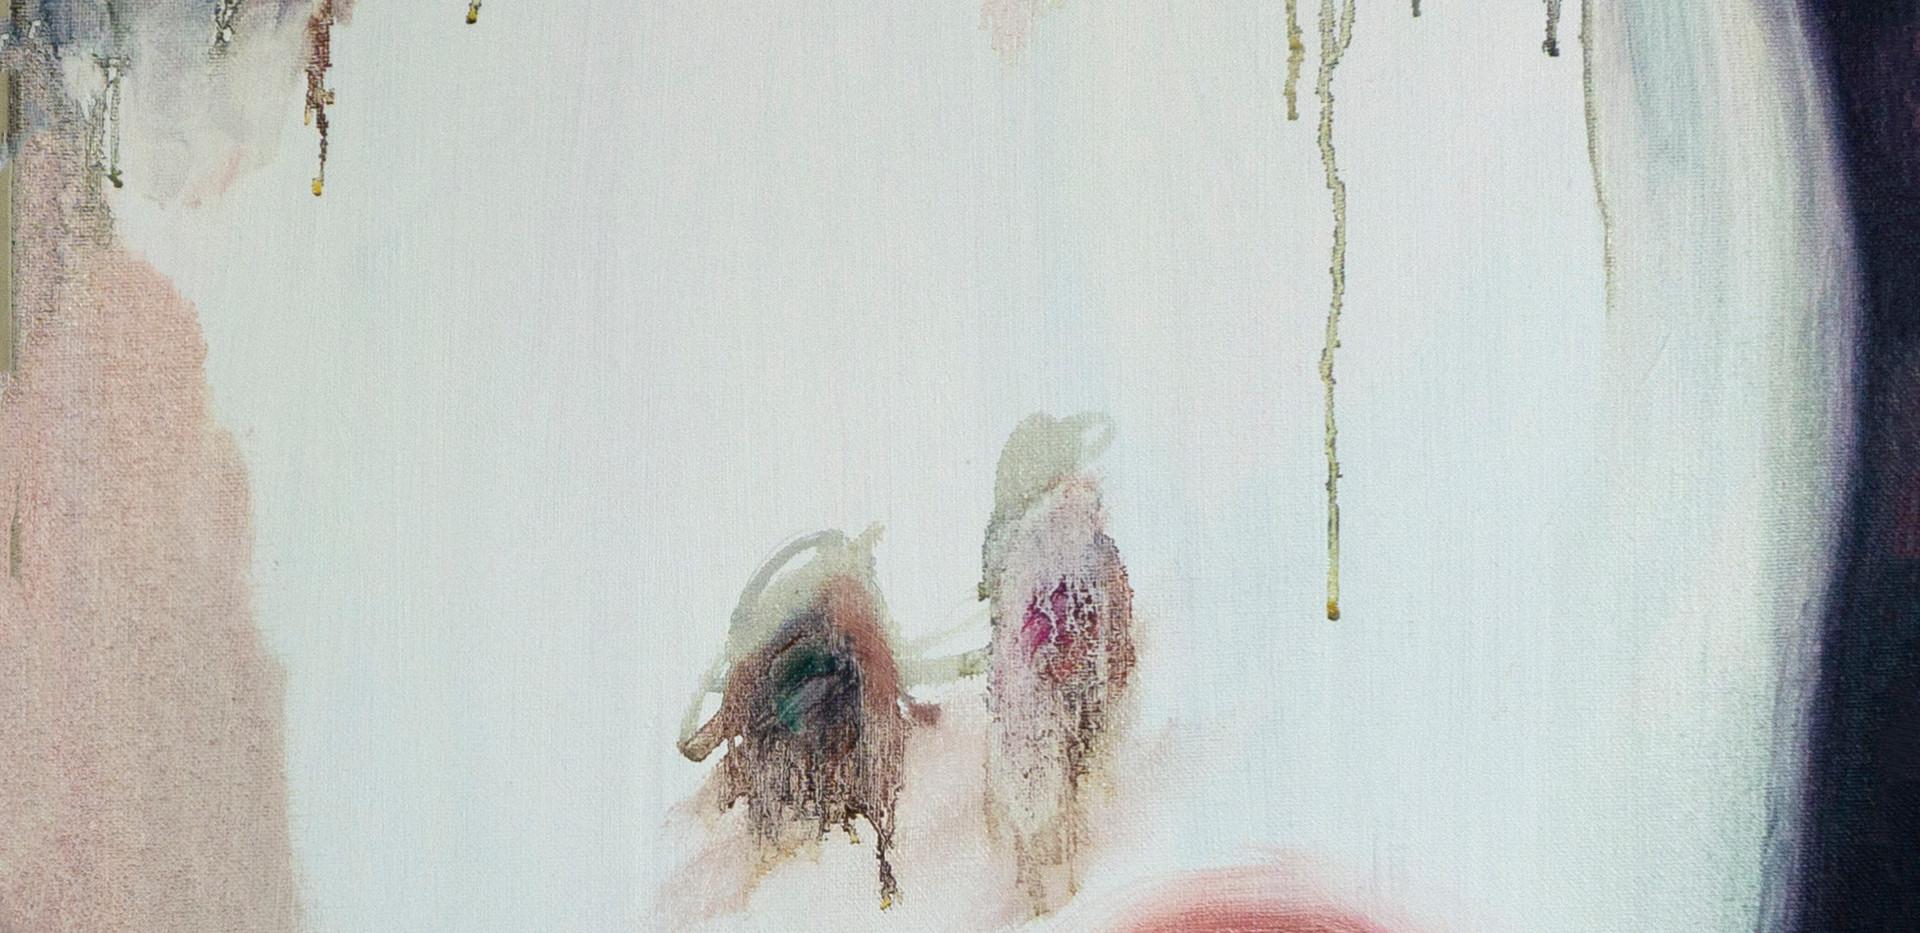 Maria Petrovskaya, Crying Girl, 2019, oil on canvas, 20 x 16